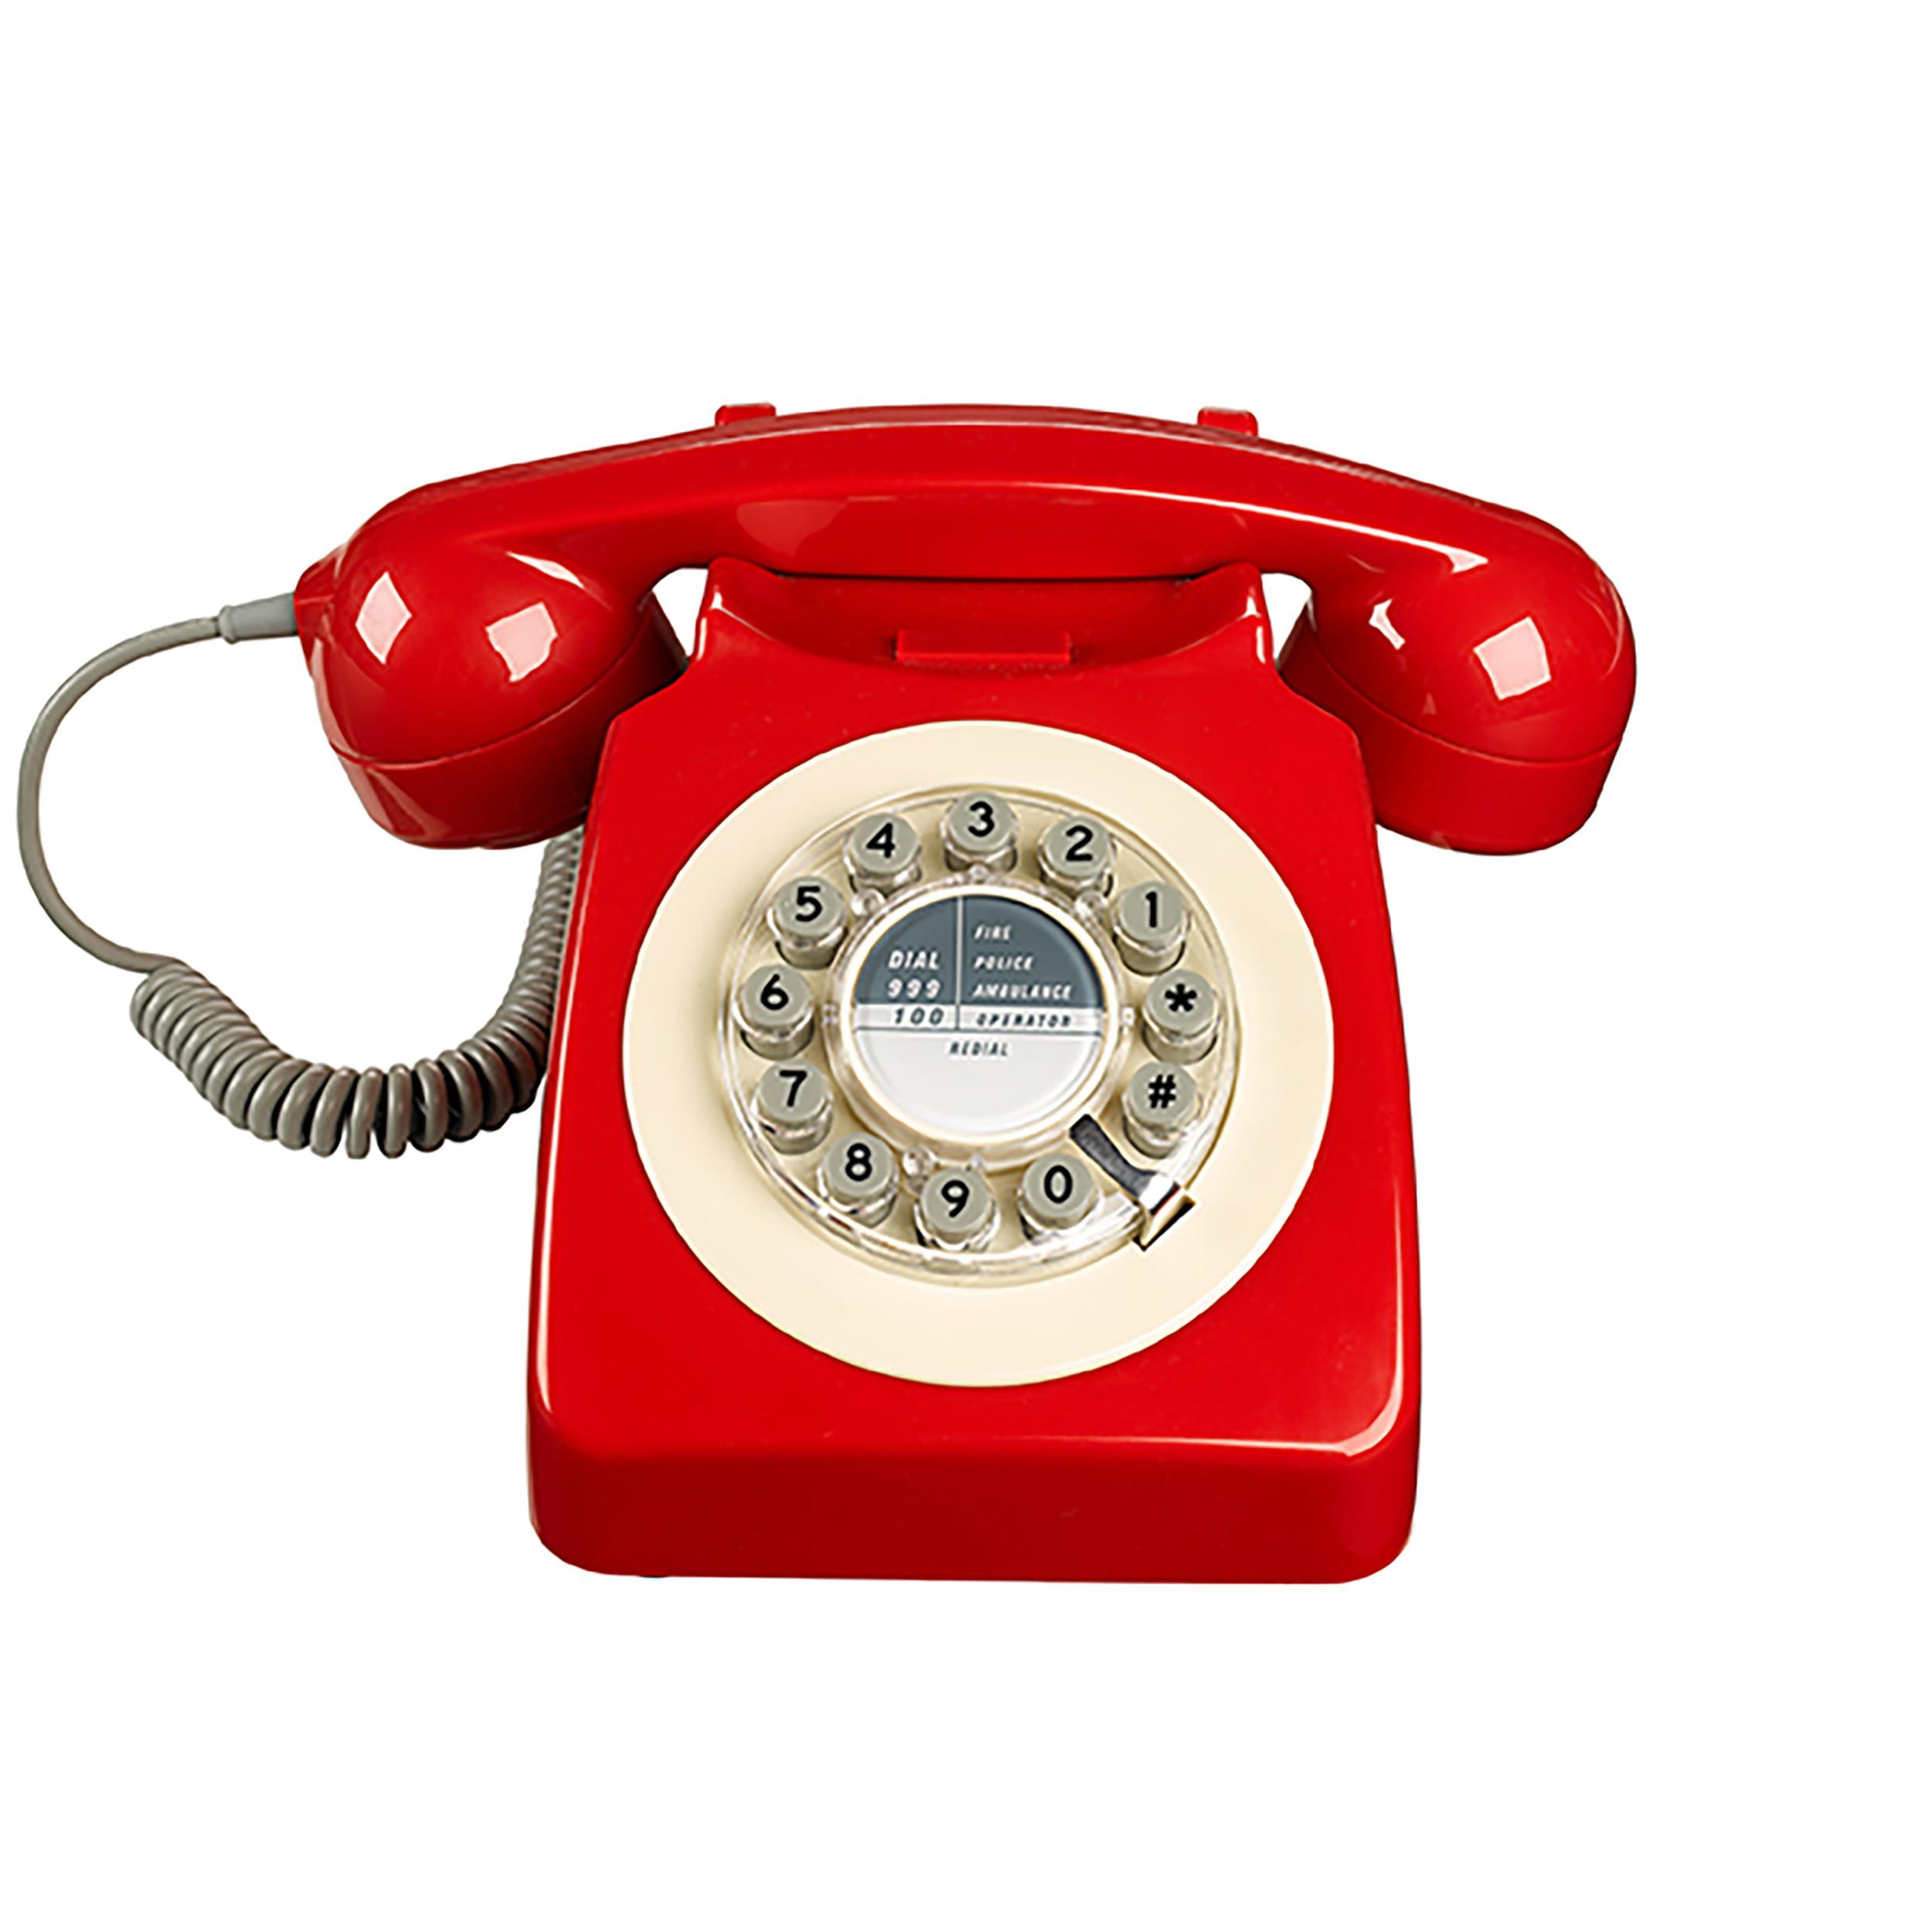 Retro 746 Series Rotary Corded Landline Phone